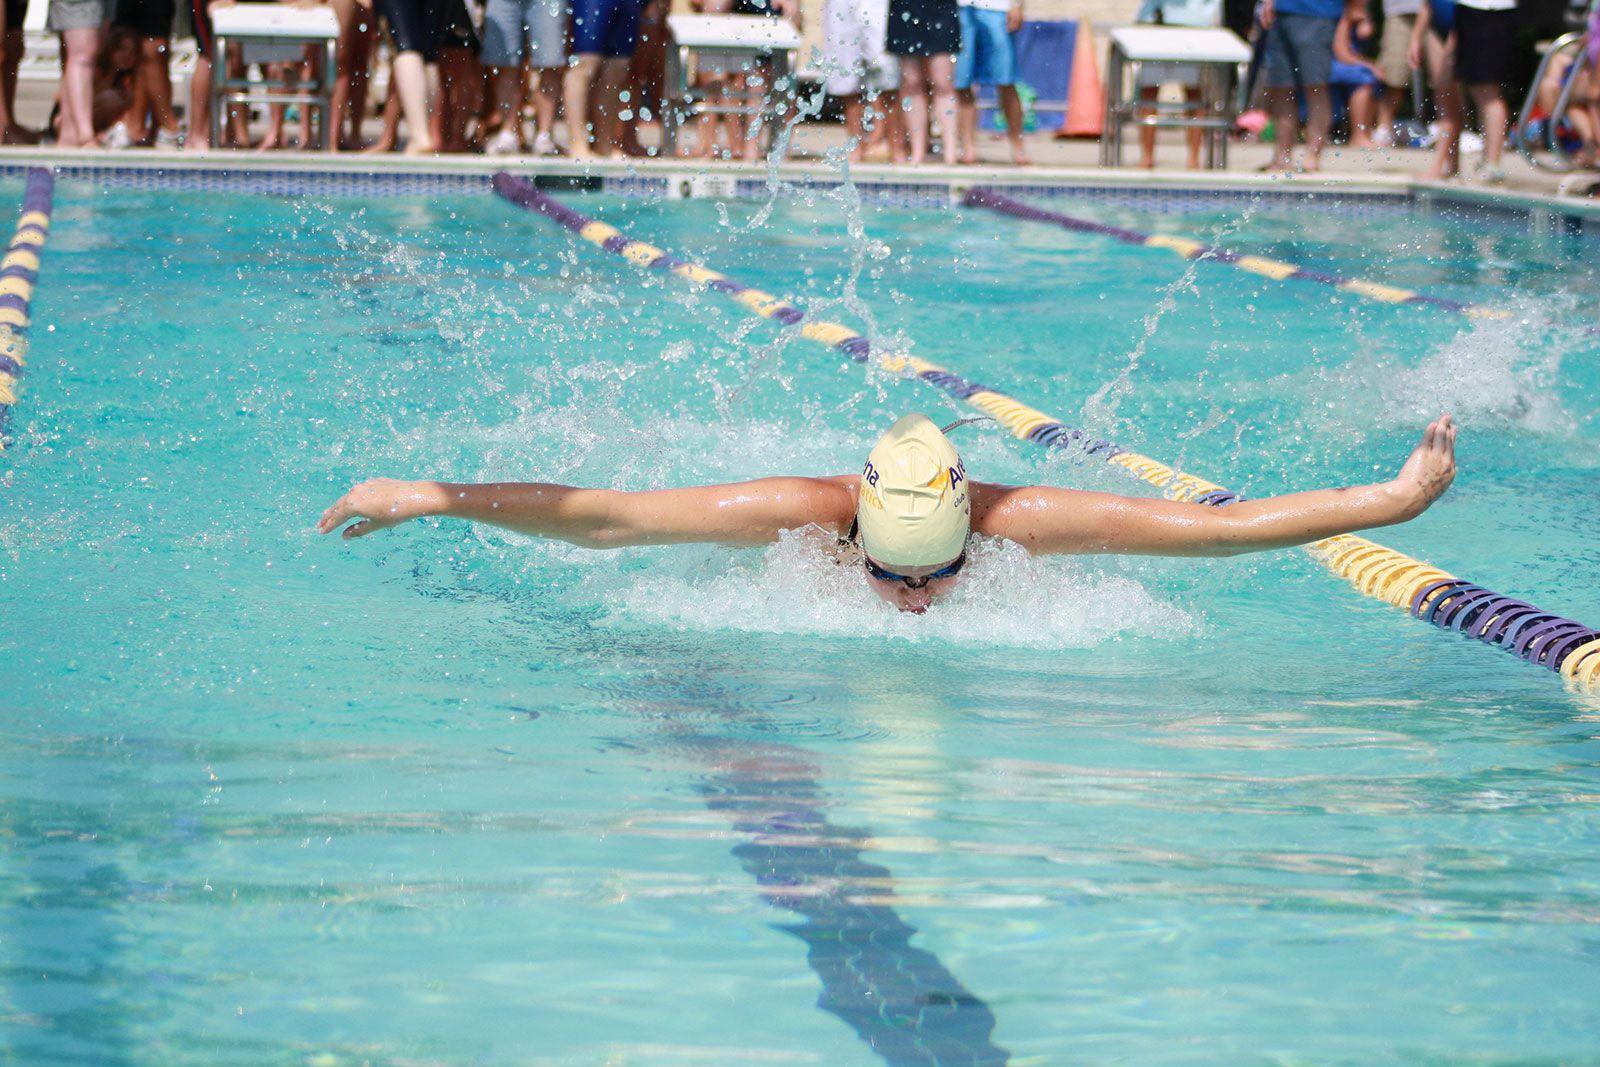 Swimmer on swim team